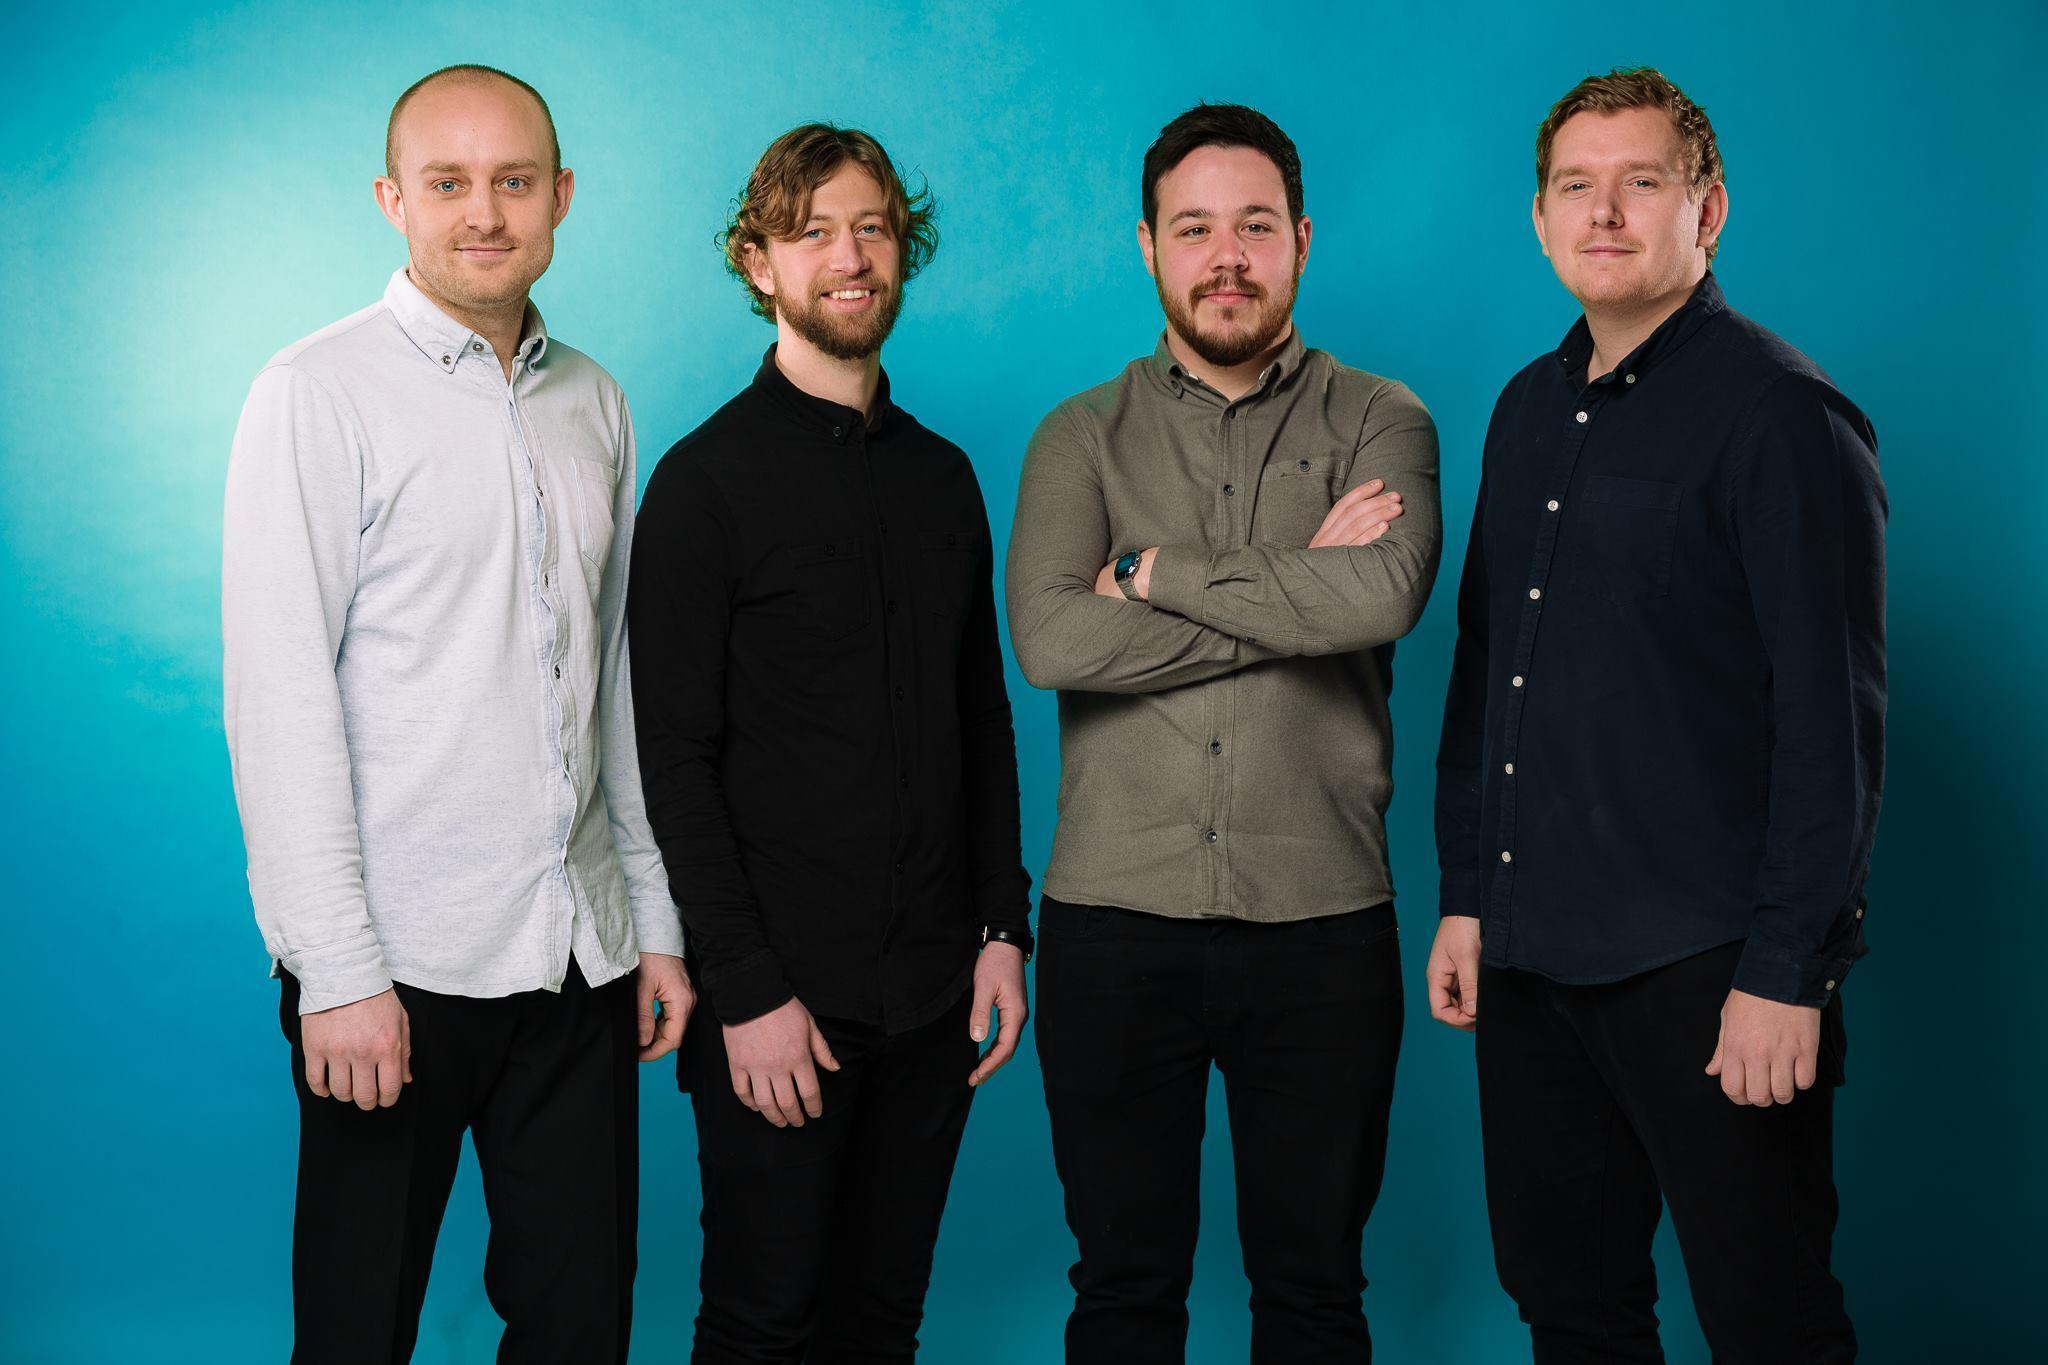 The Colour Blue Band